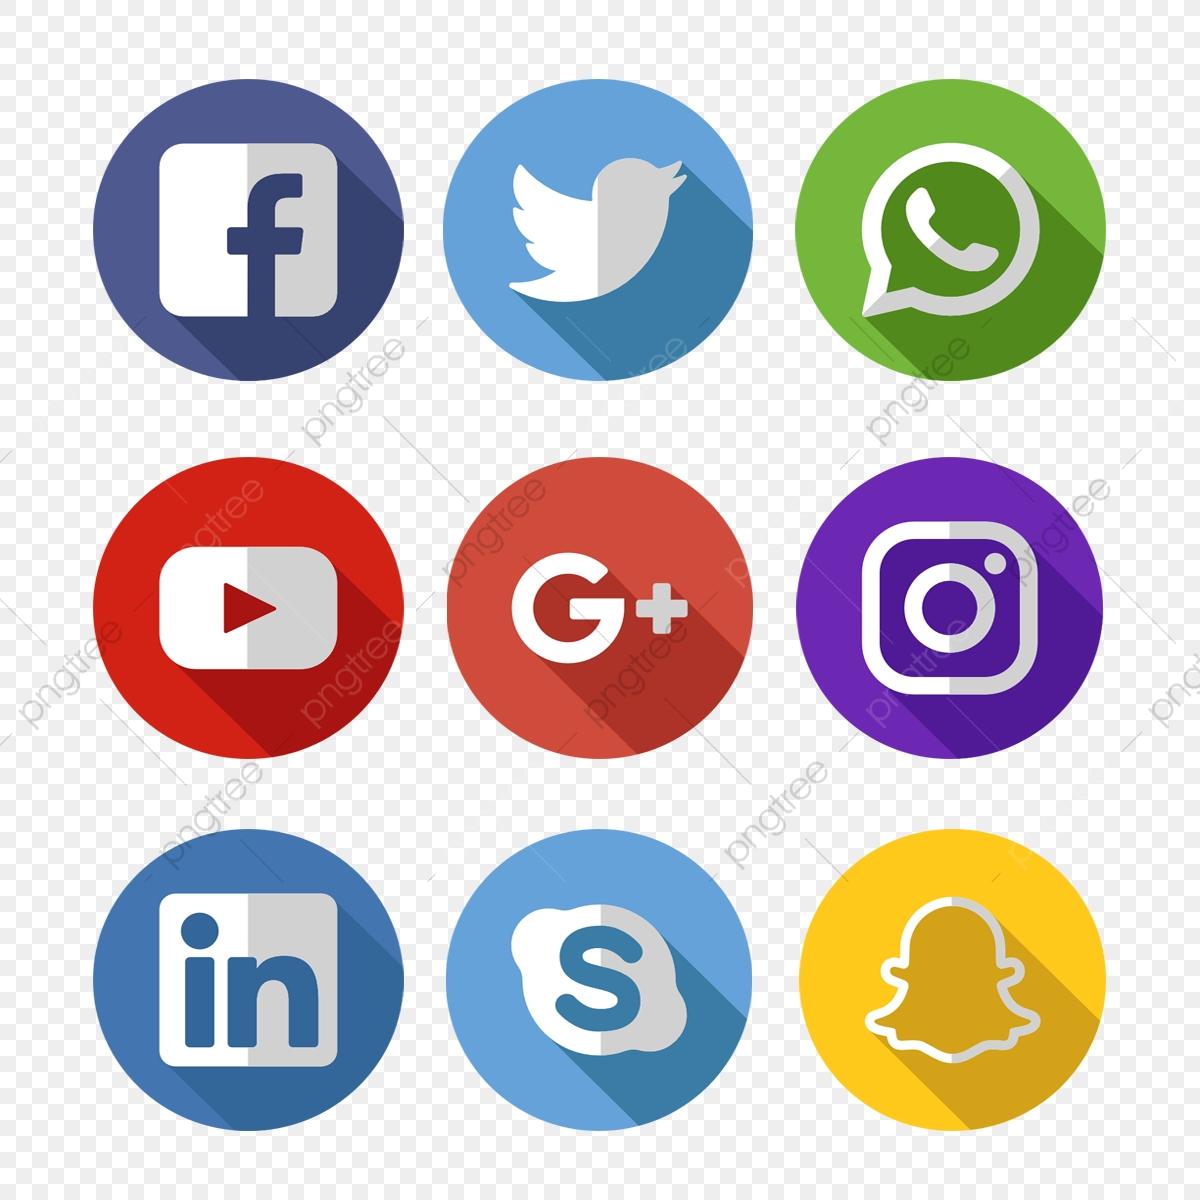 Iconos De Redes Sociales, Iconos De Redes Sociales, Facebook.